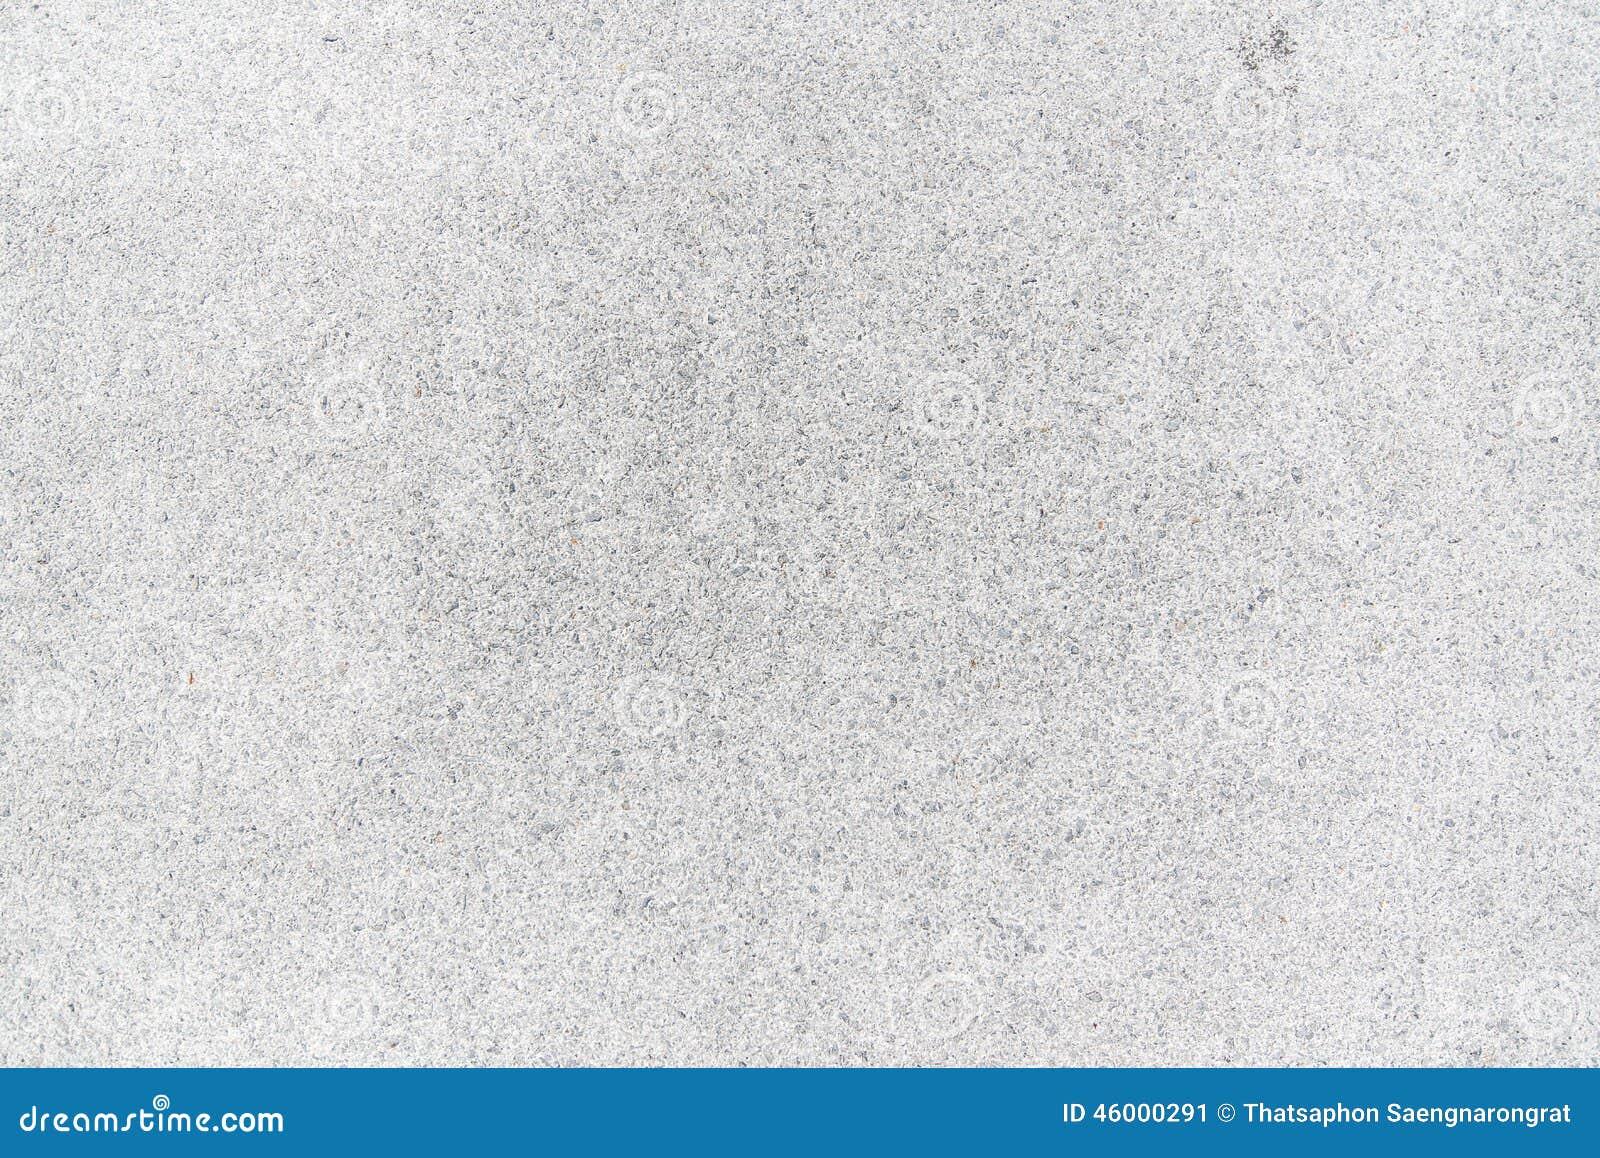 Floor Material old gray terrazzo floor material stock photo - image: 46000291